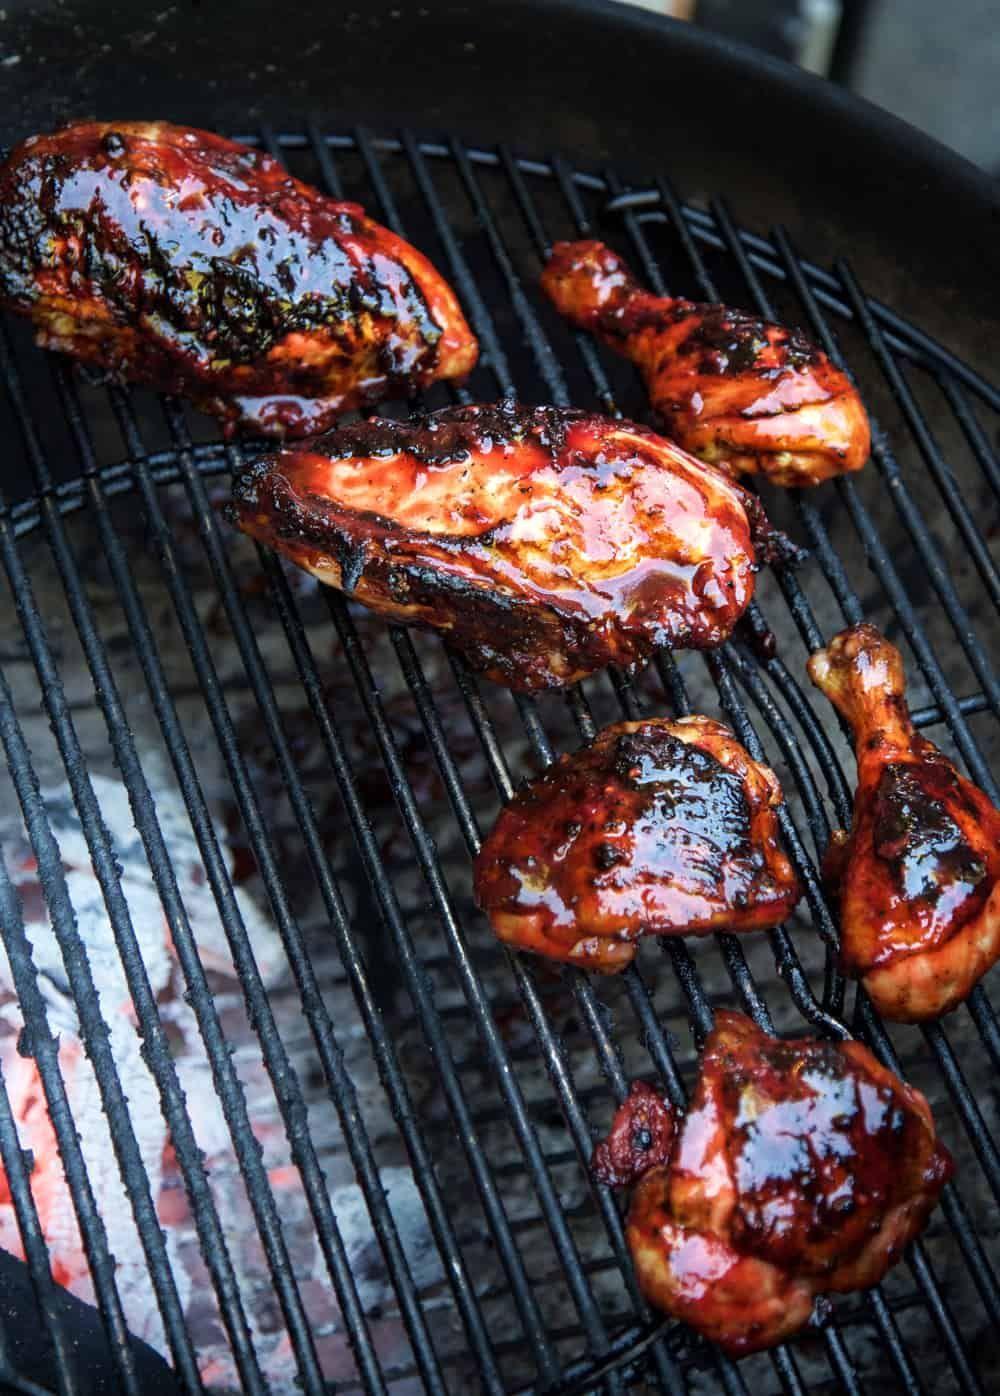 Grilled chicken with blackberry bbq sauce recipe